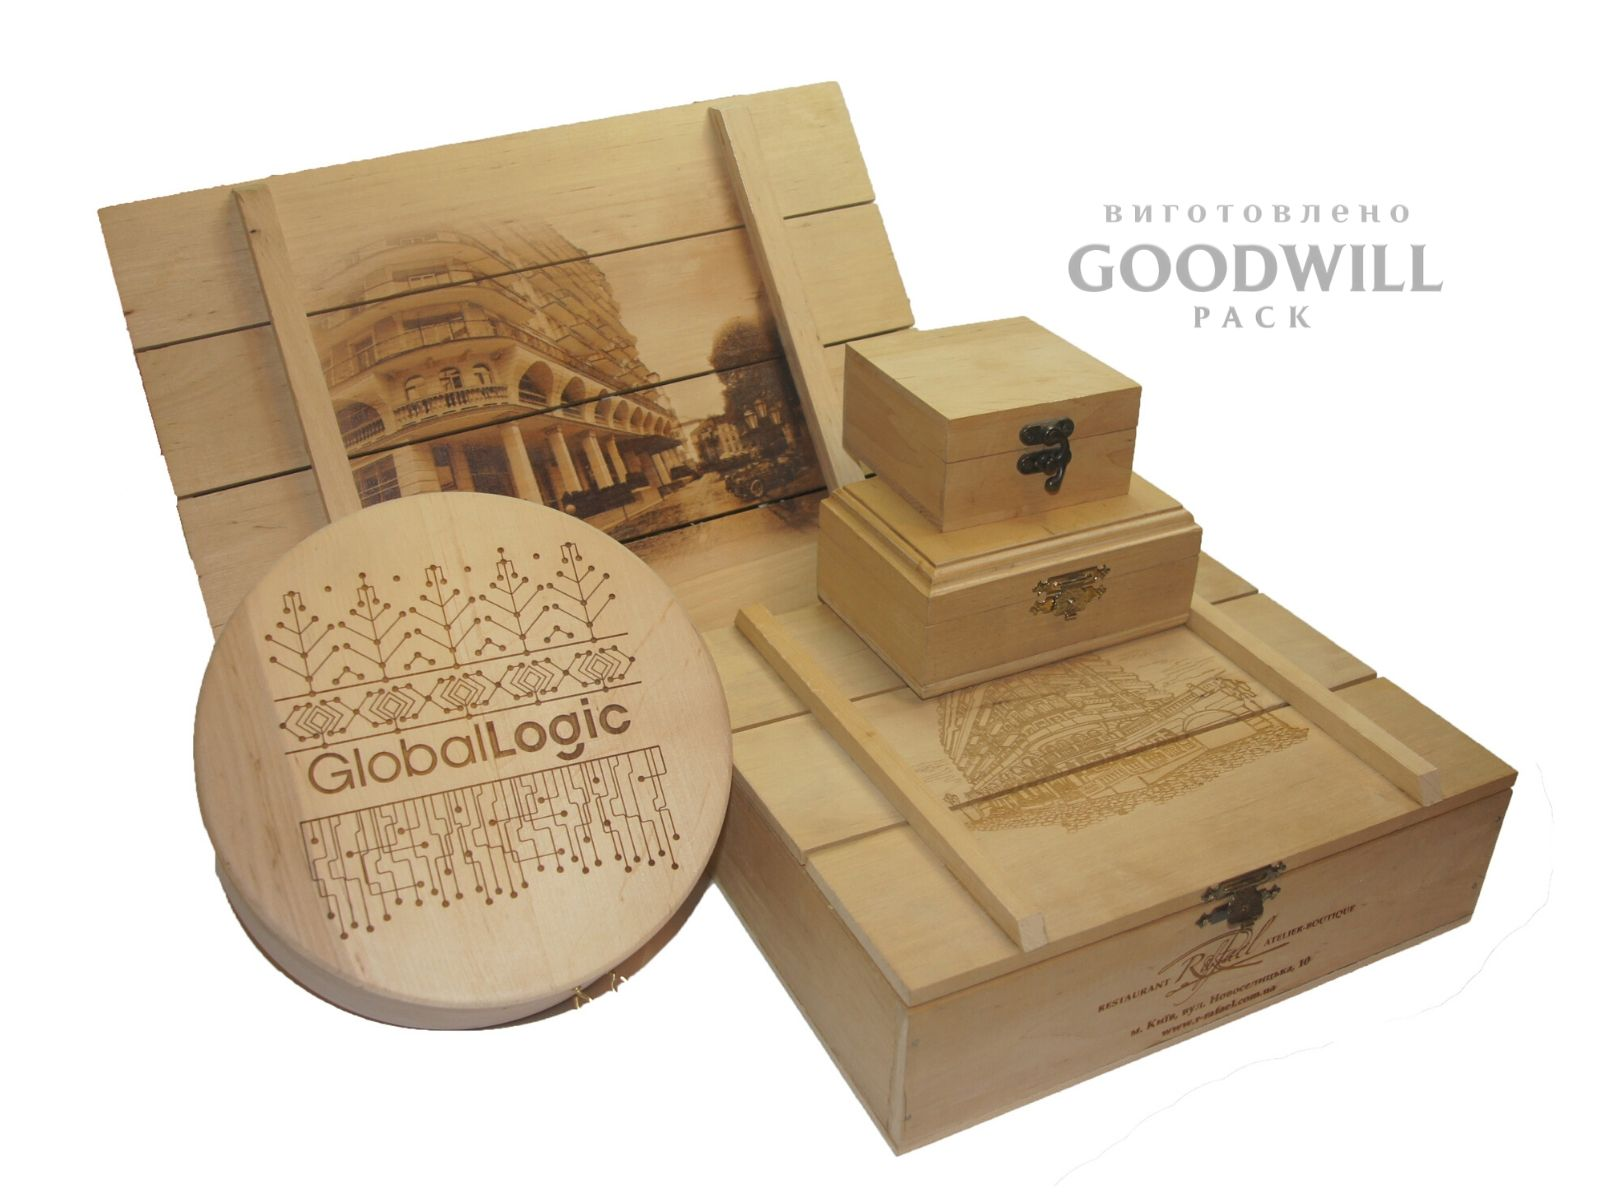 Деревянные коробки на заказ